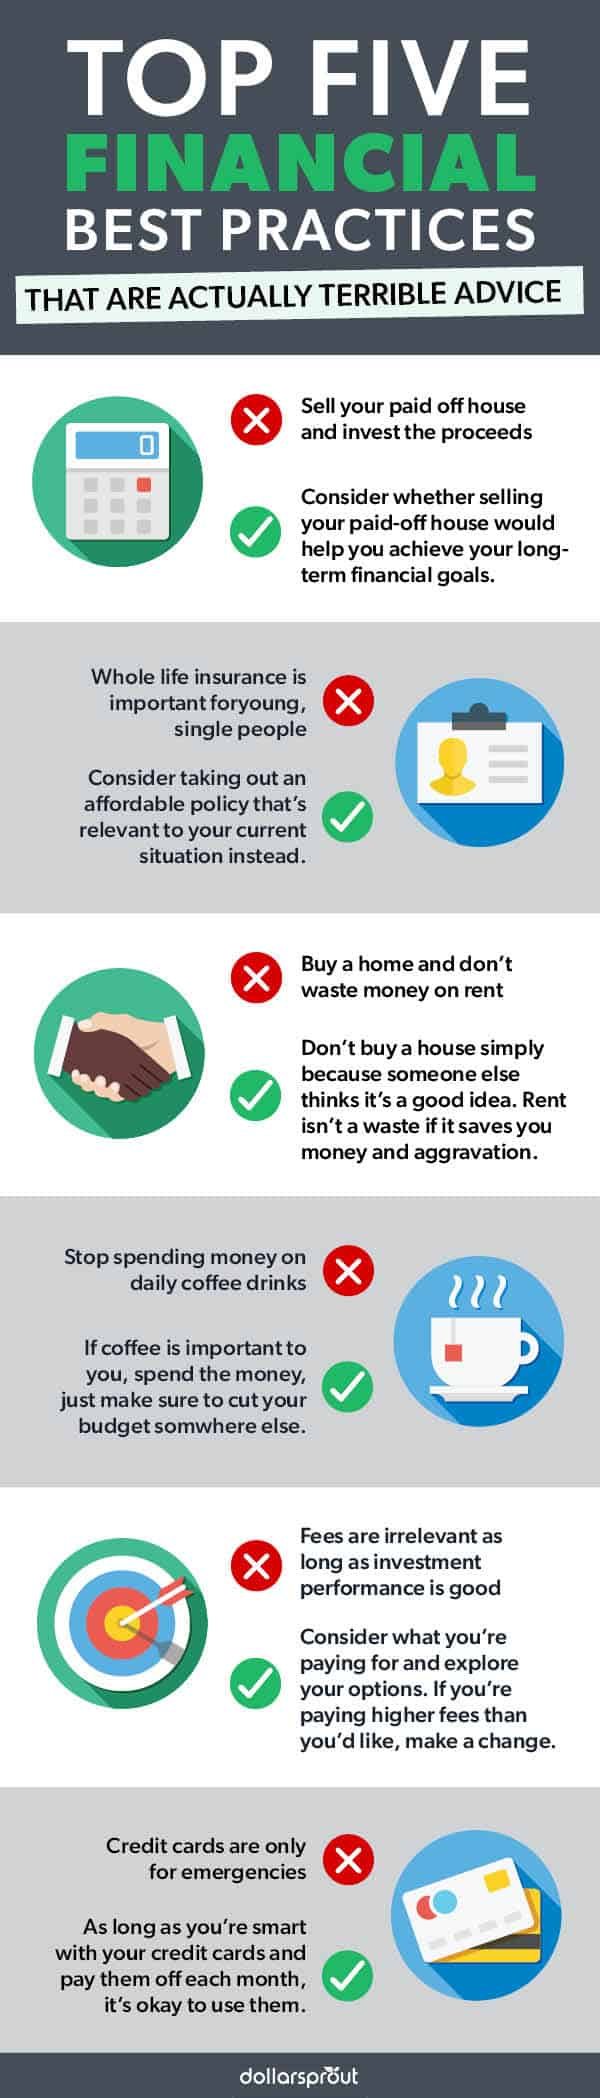 Bad financial advice